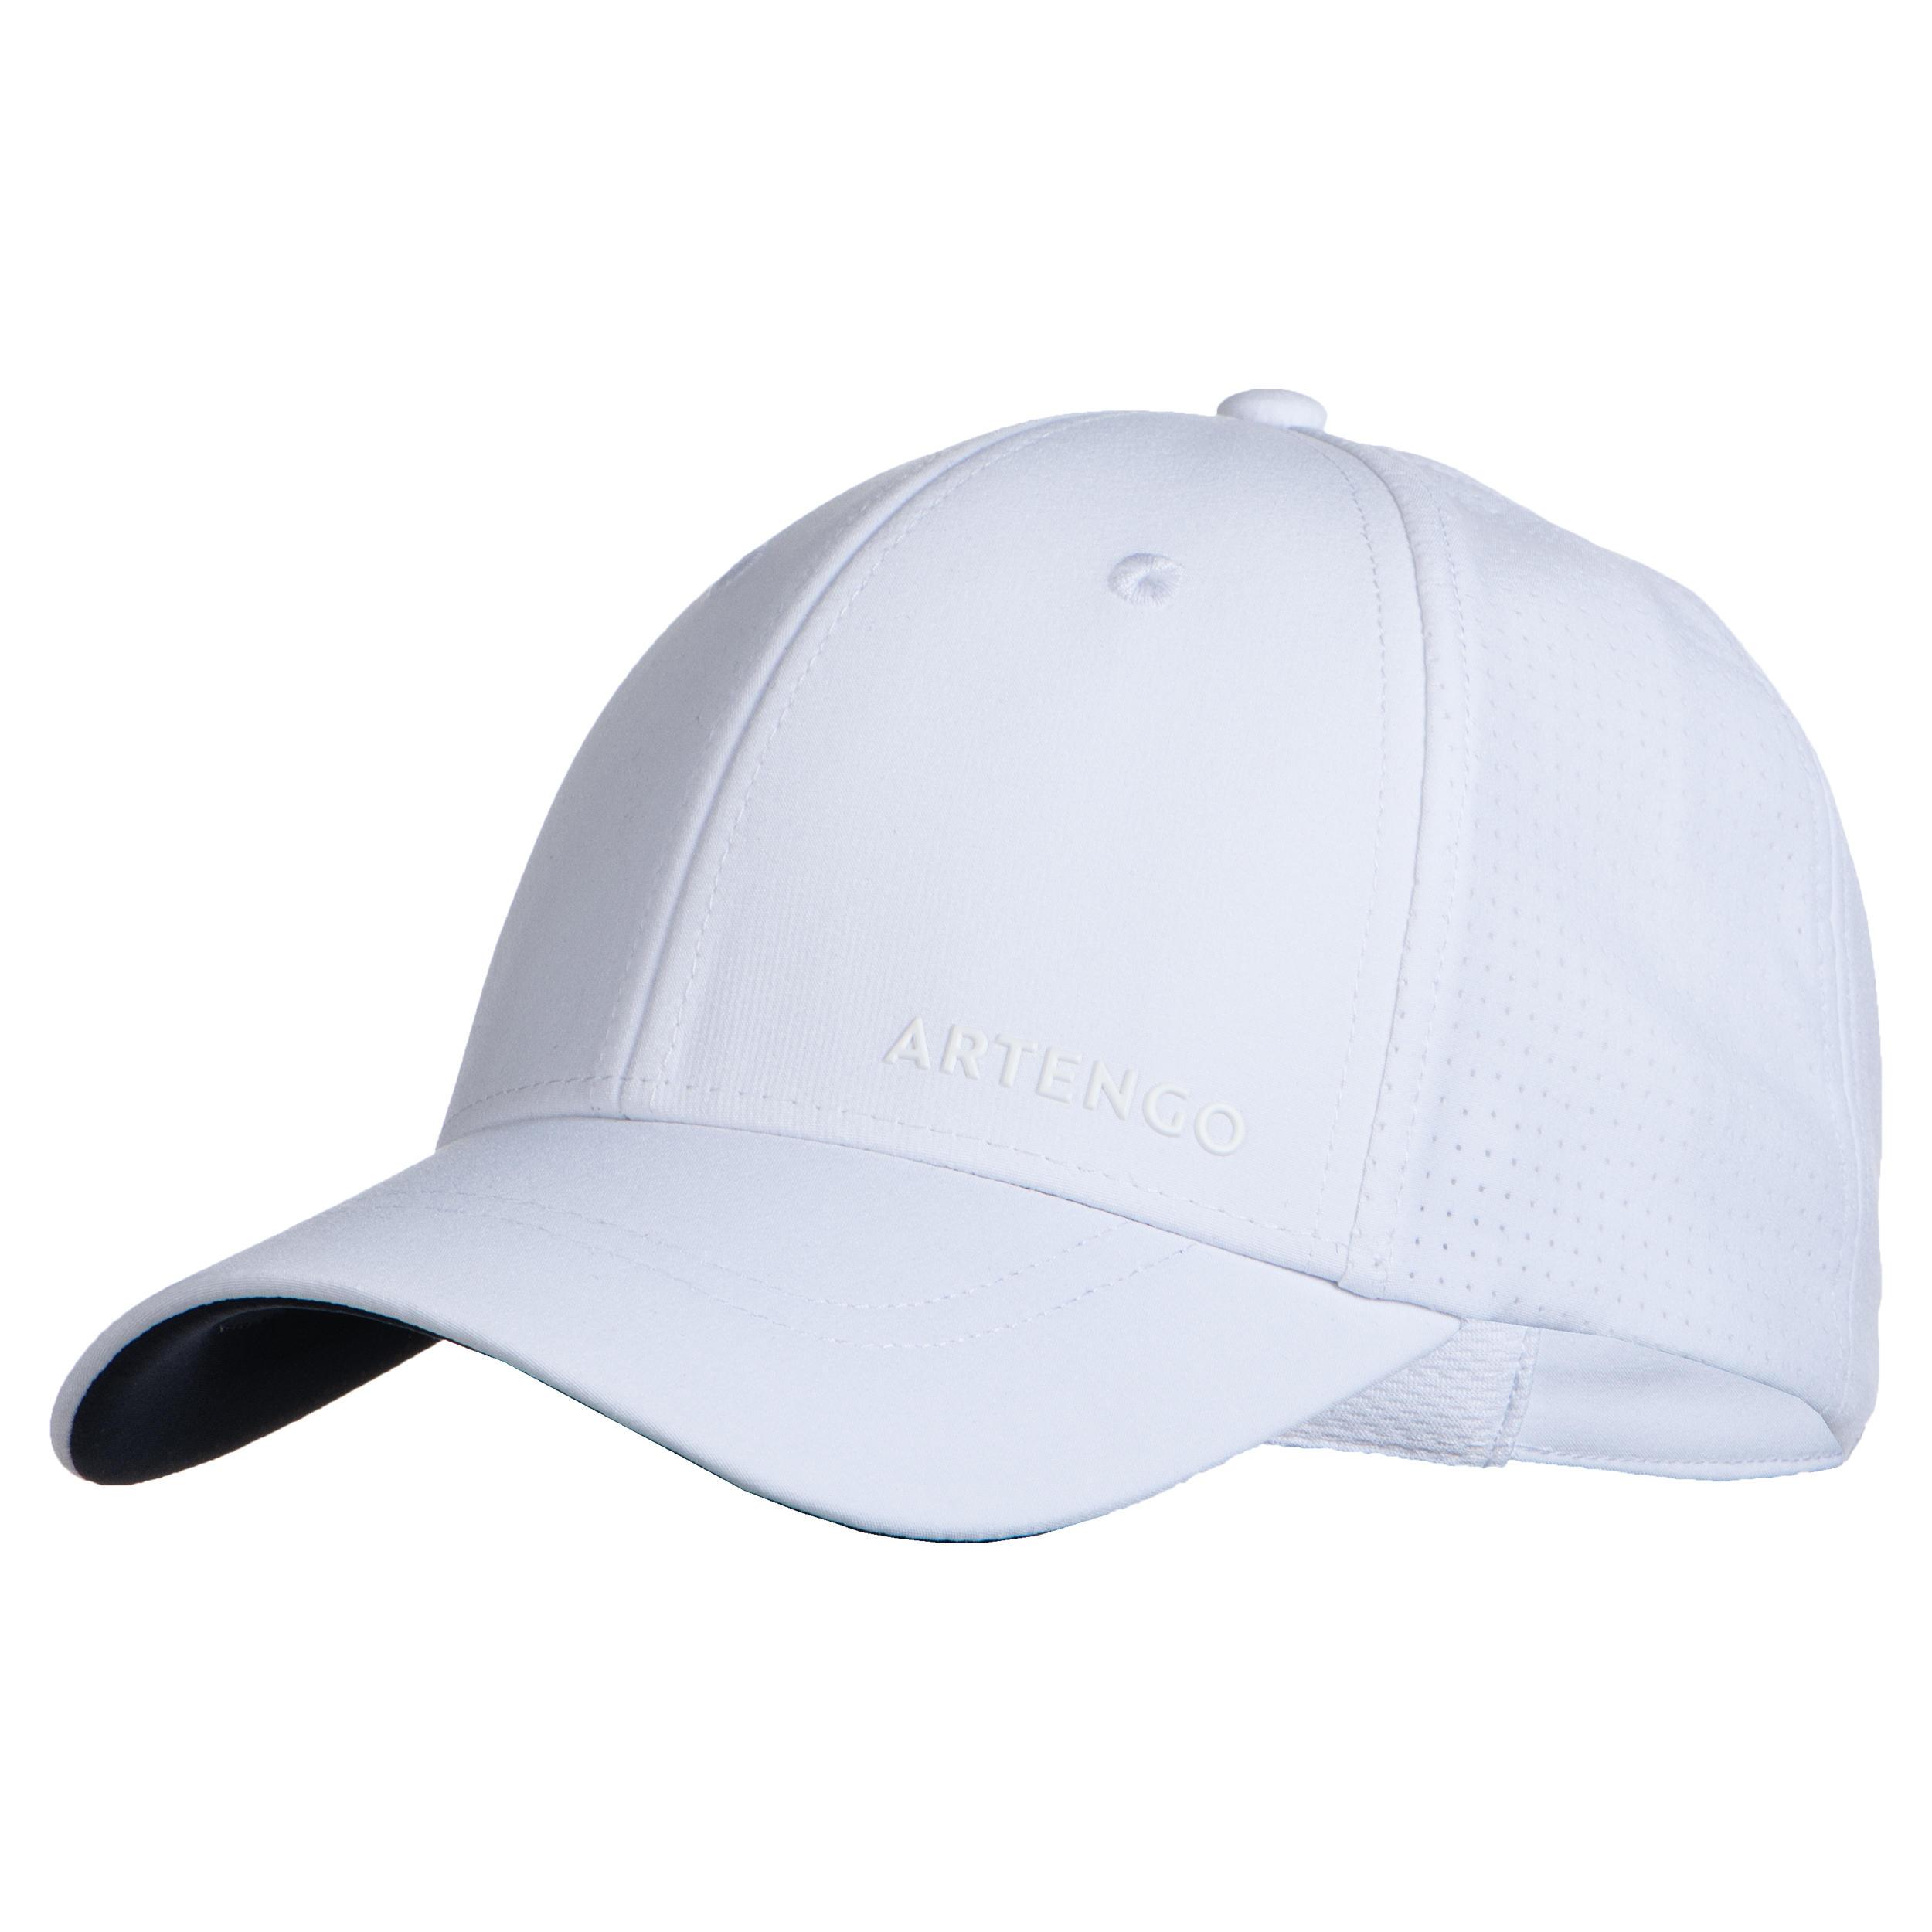 Schirmmütze Tennis-Cap TC 900 Gr. 56 weiss/marineblau